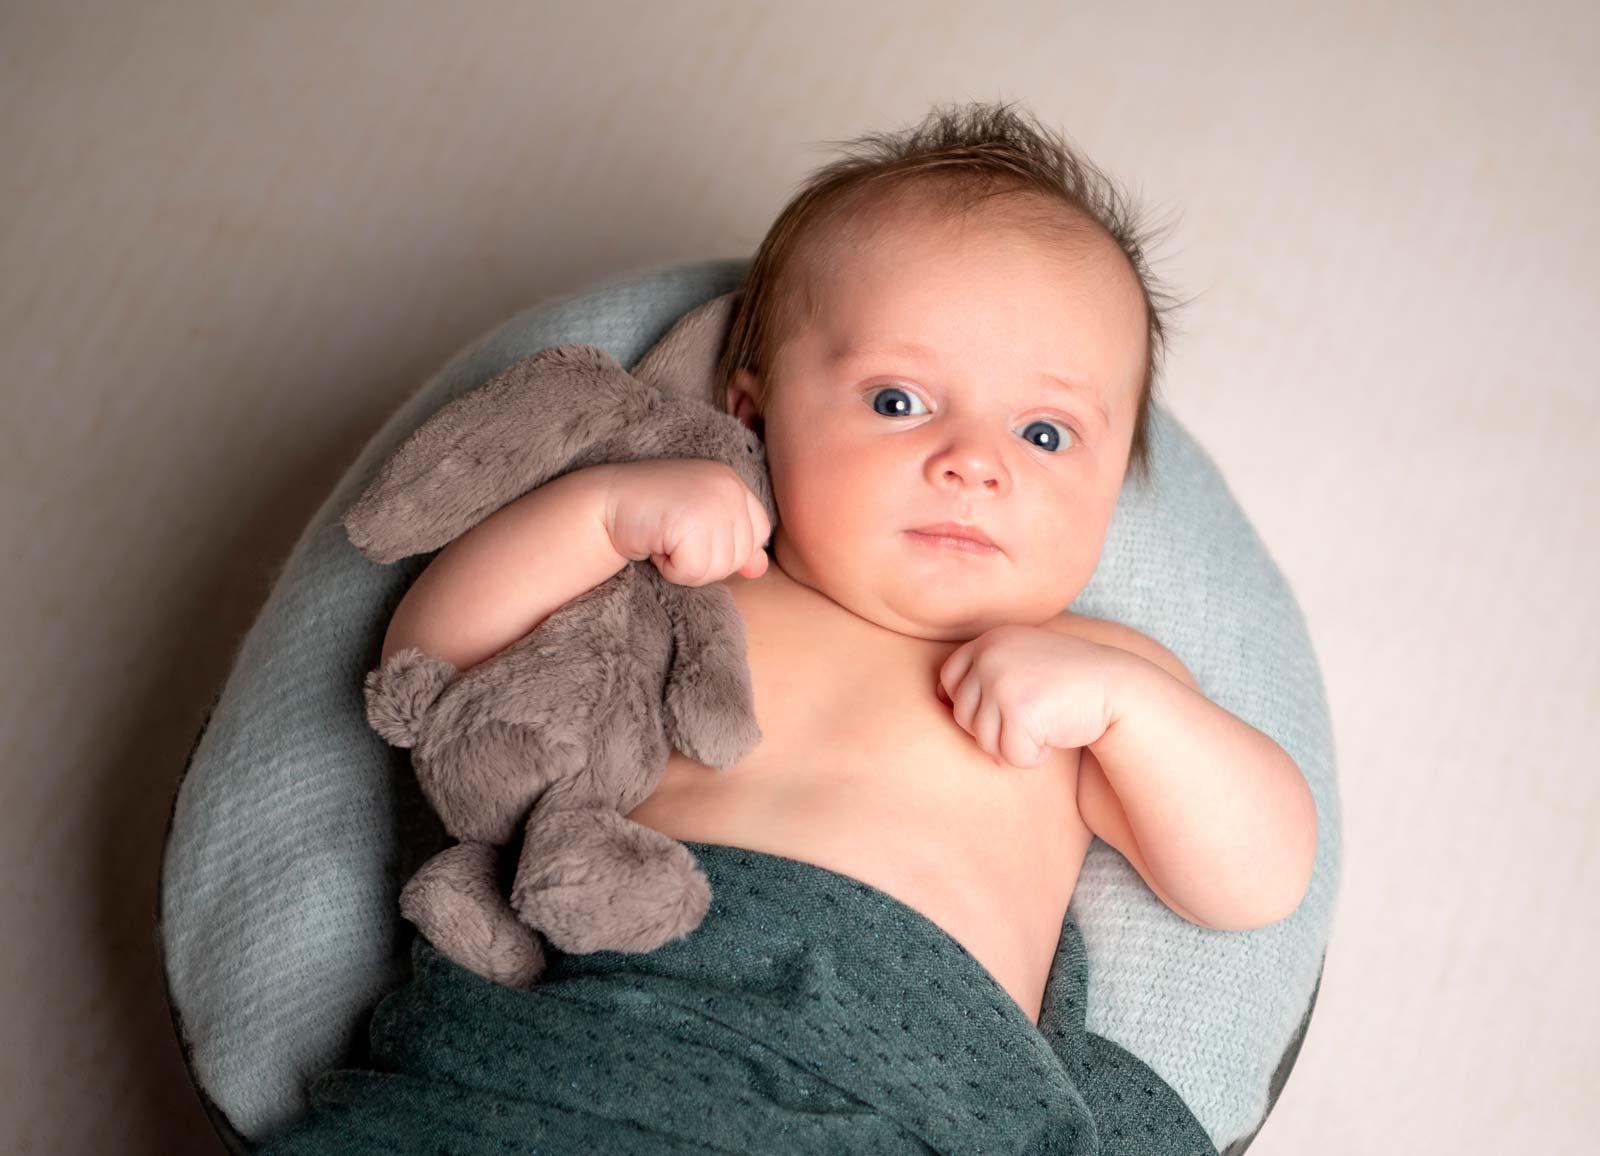 baqbyfotoshooting statt neugeborenenshooting